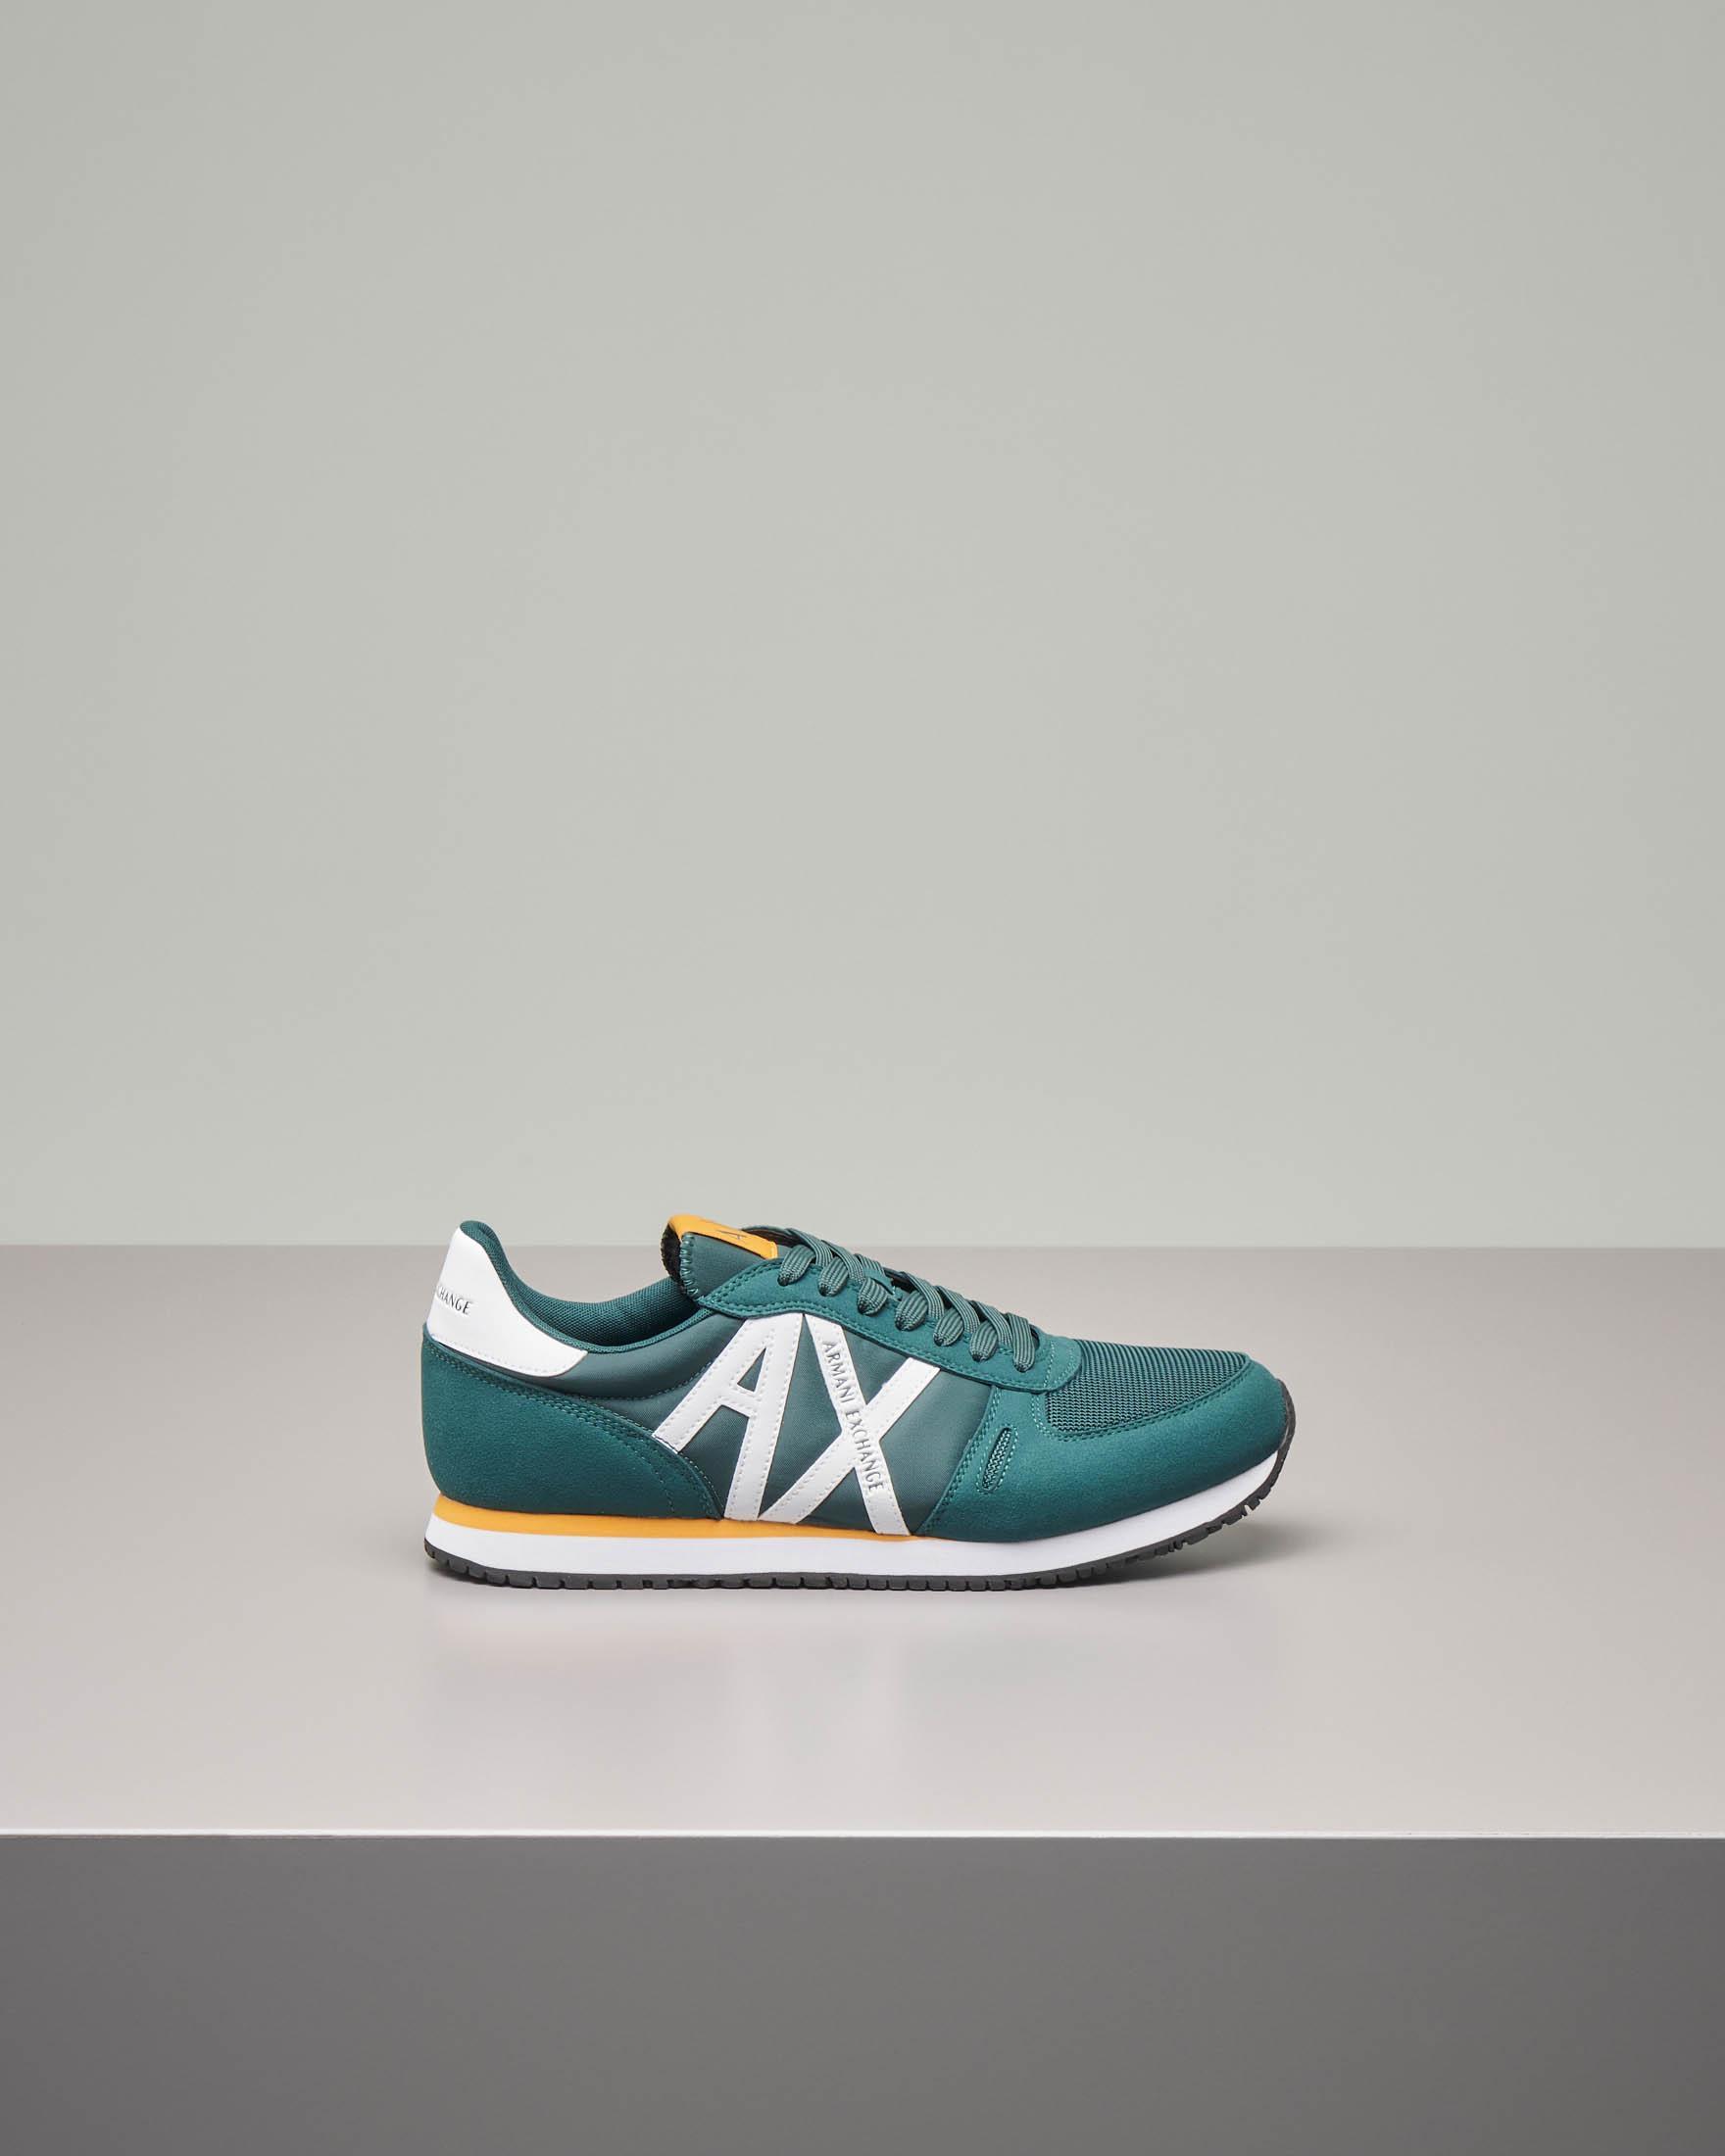 Sneakers verde con logo AX bianco